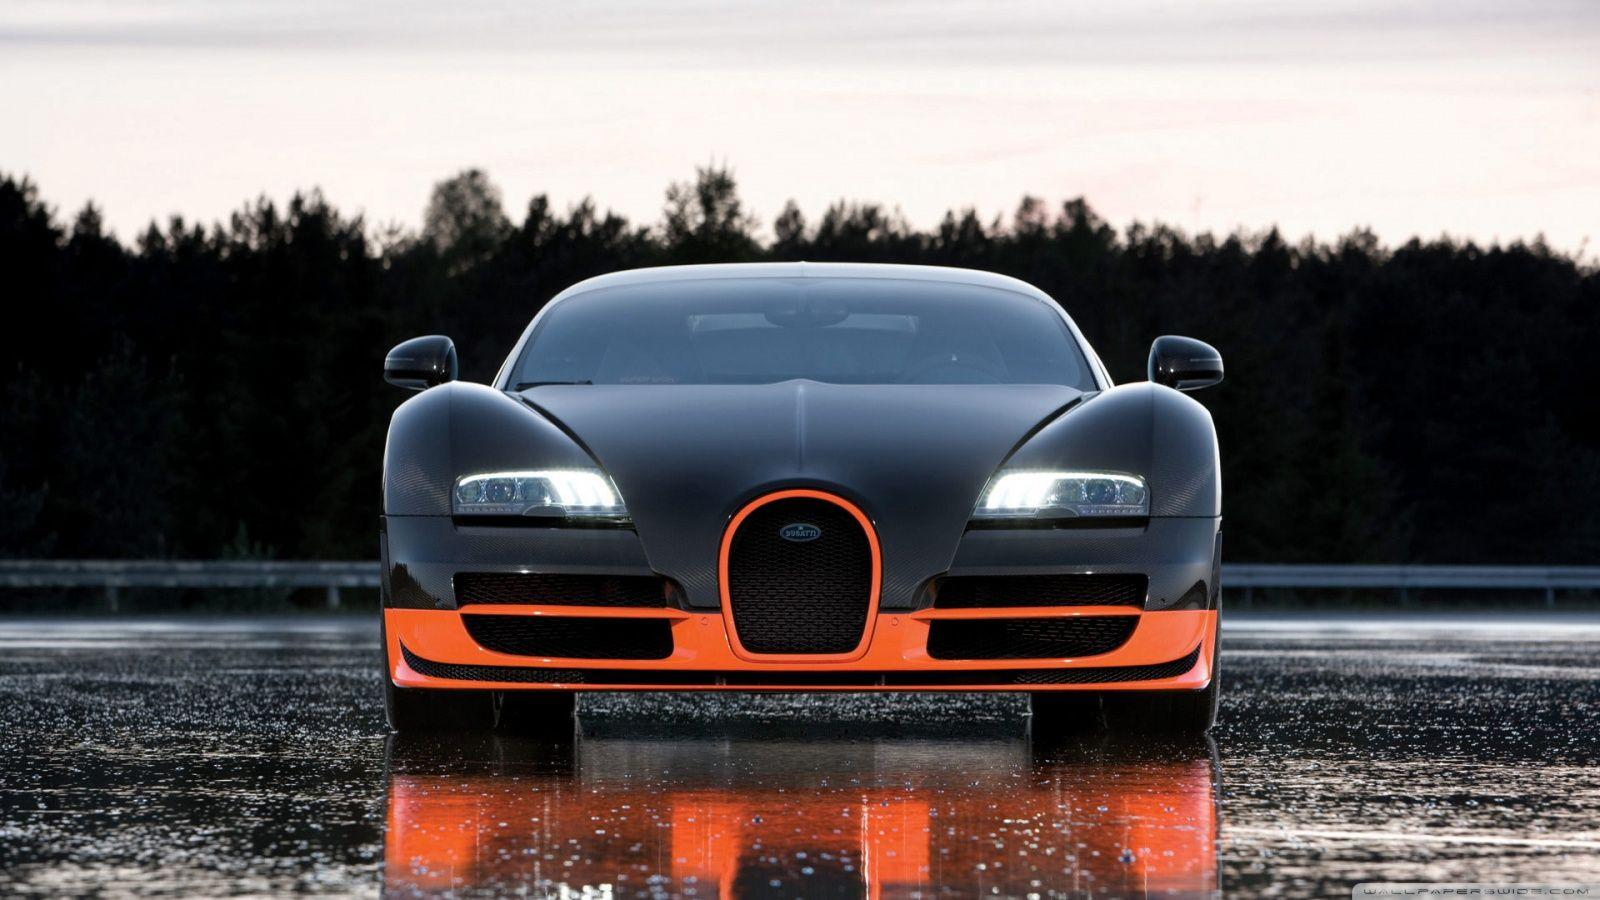 Bugatti Veyron Eb Wallpapers Wallpaper Cave